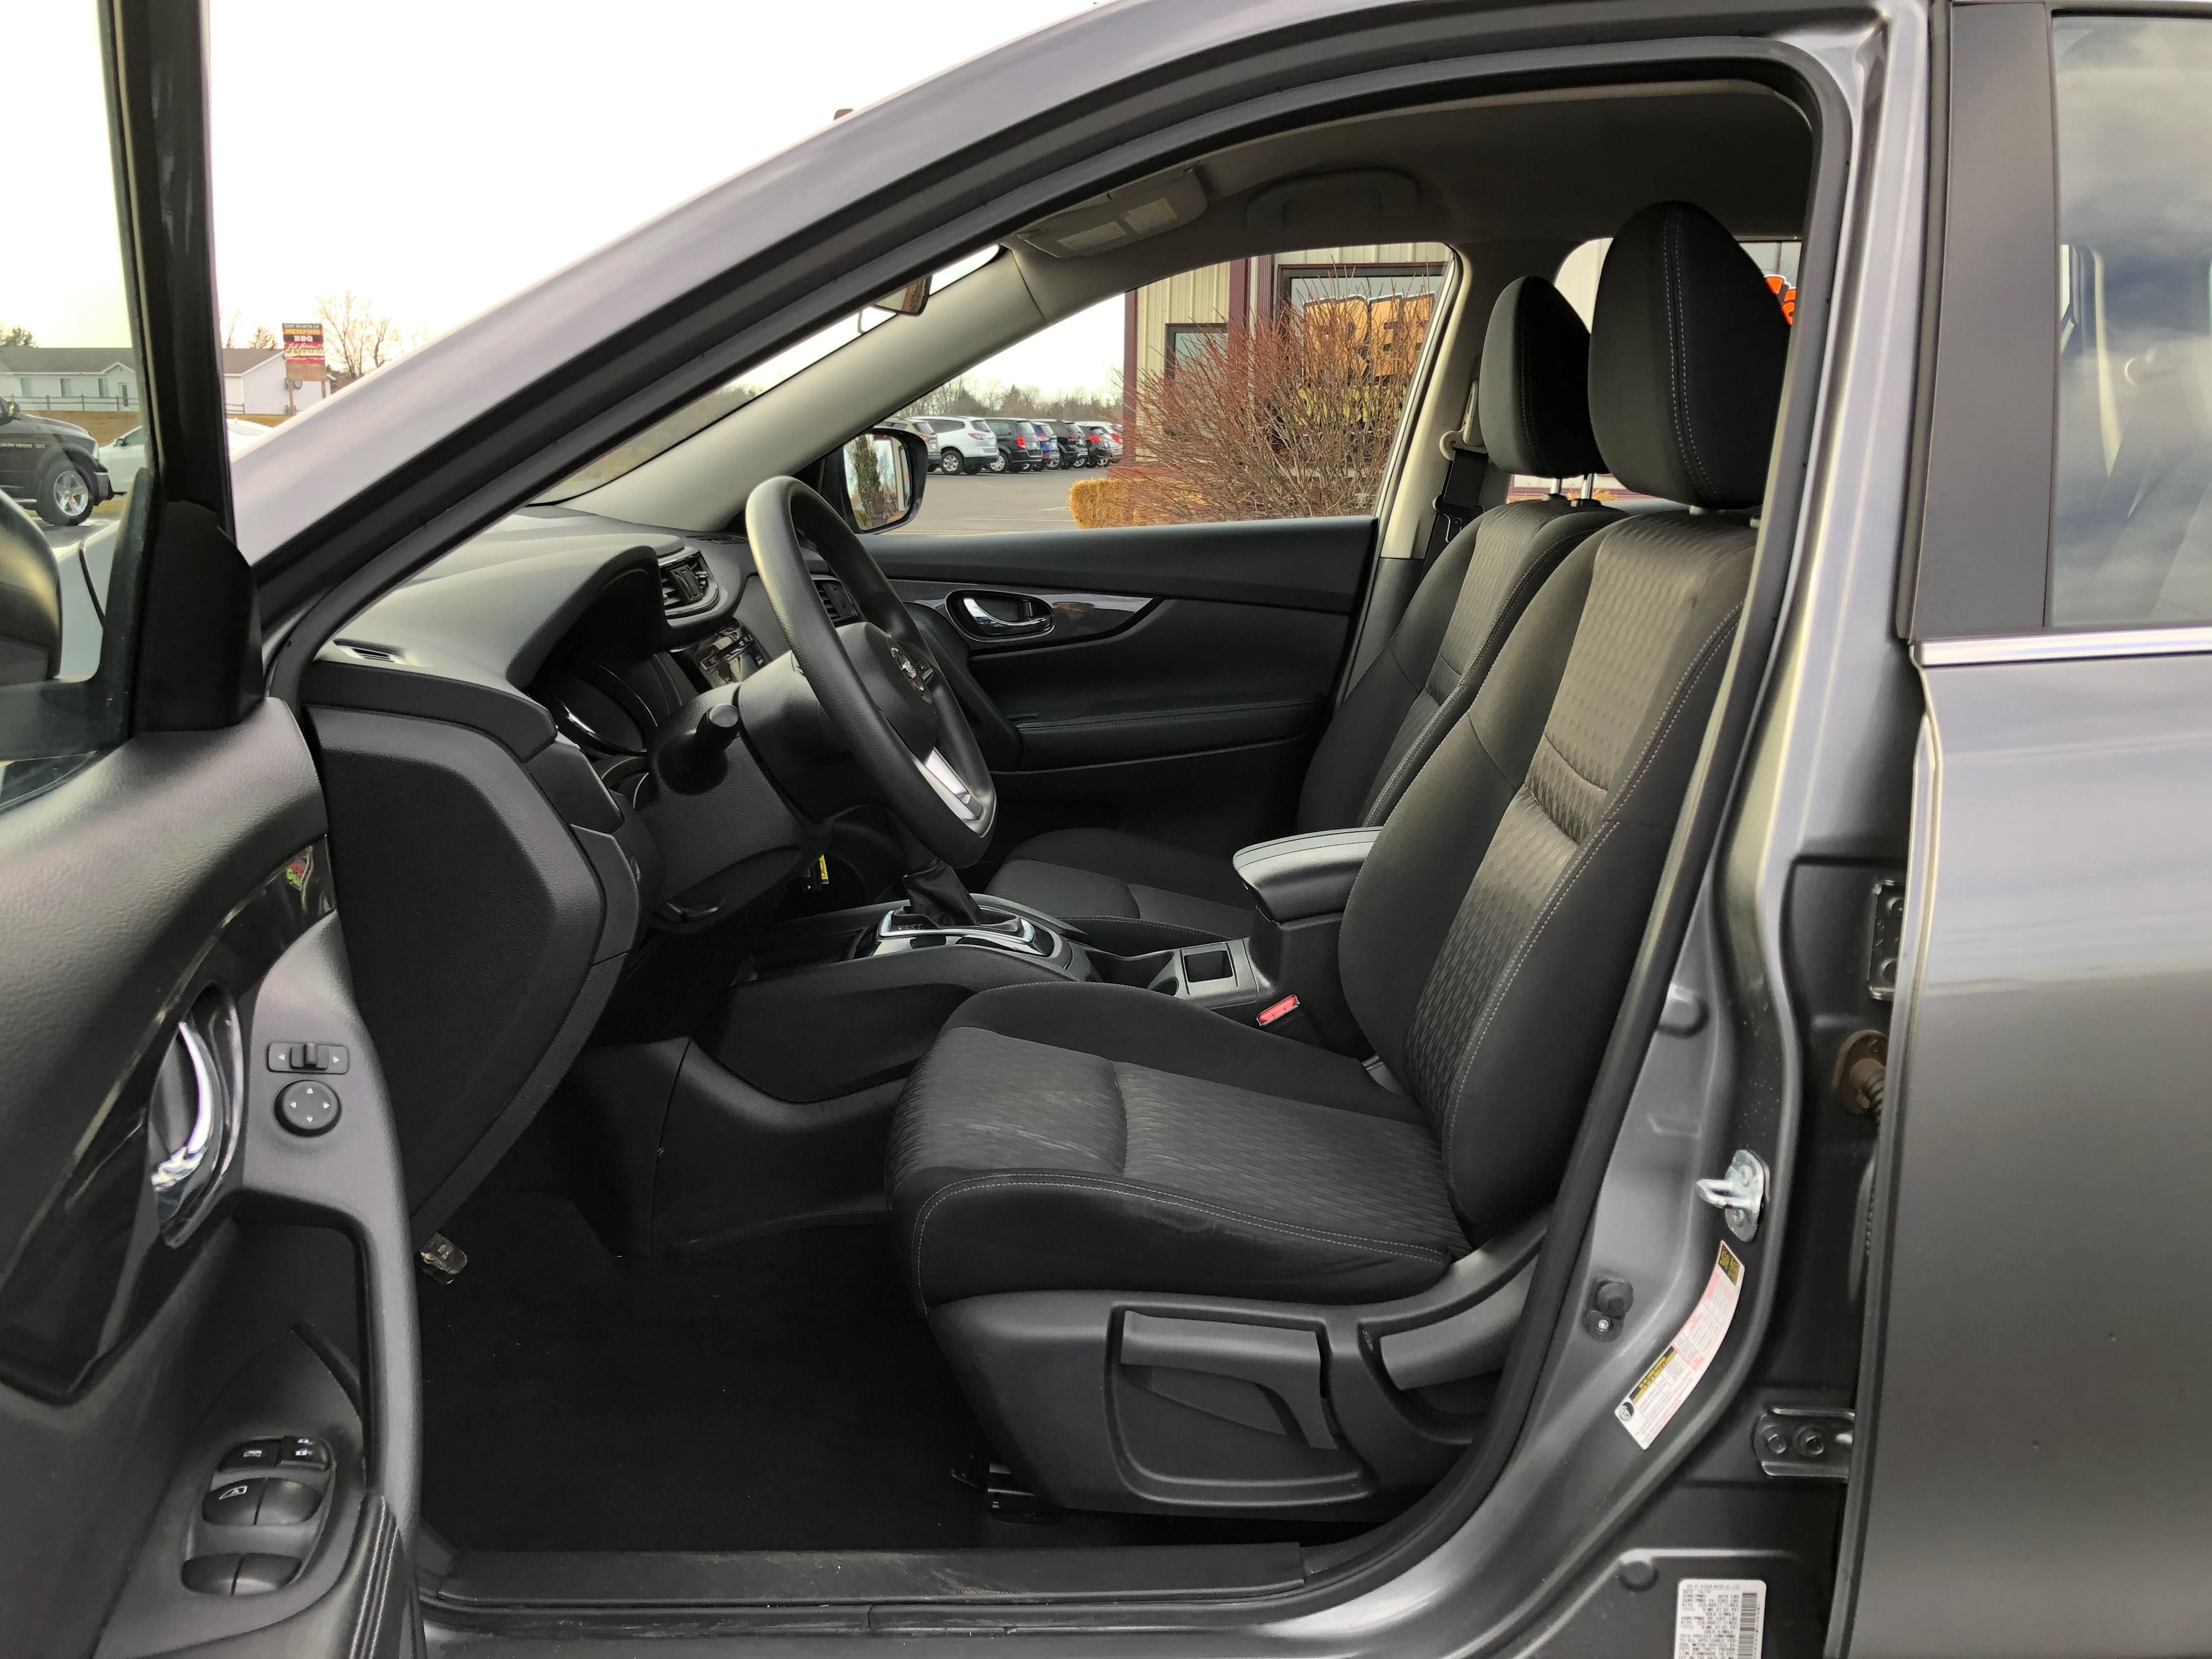 used vehicle - SUV NISSAN ROGUE 2017